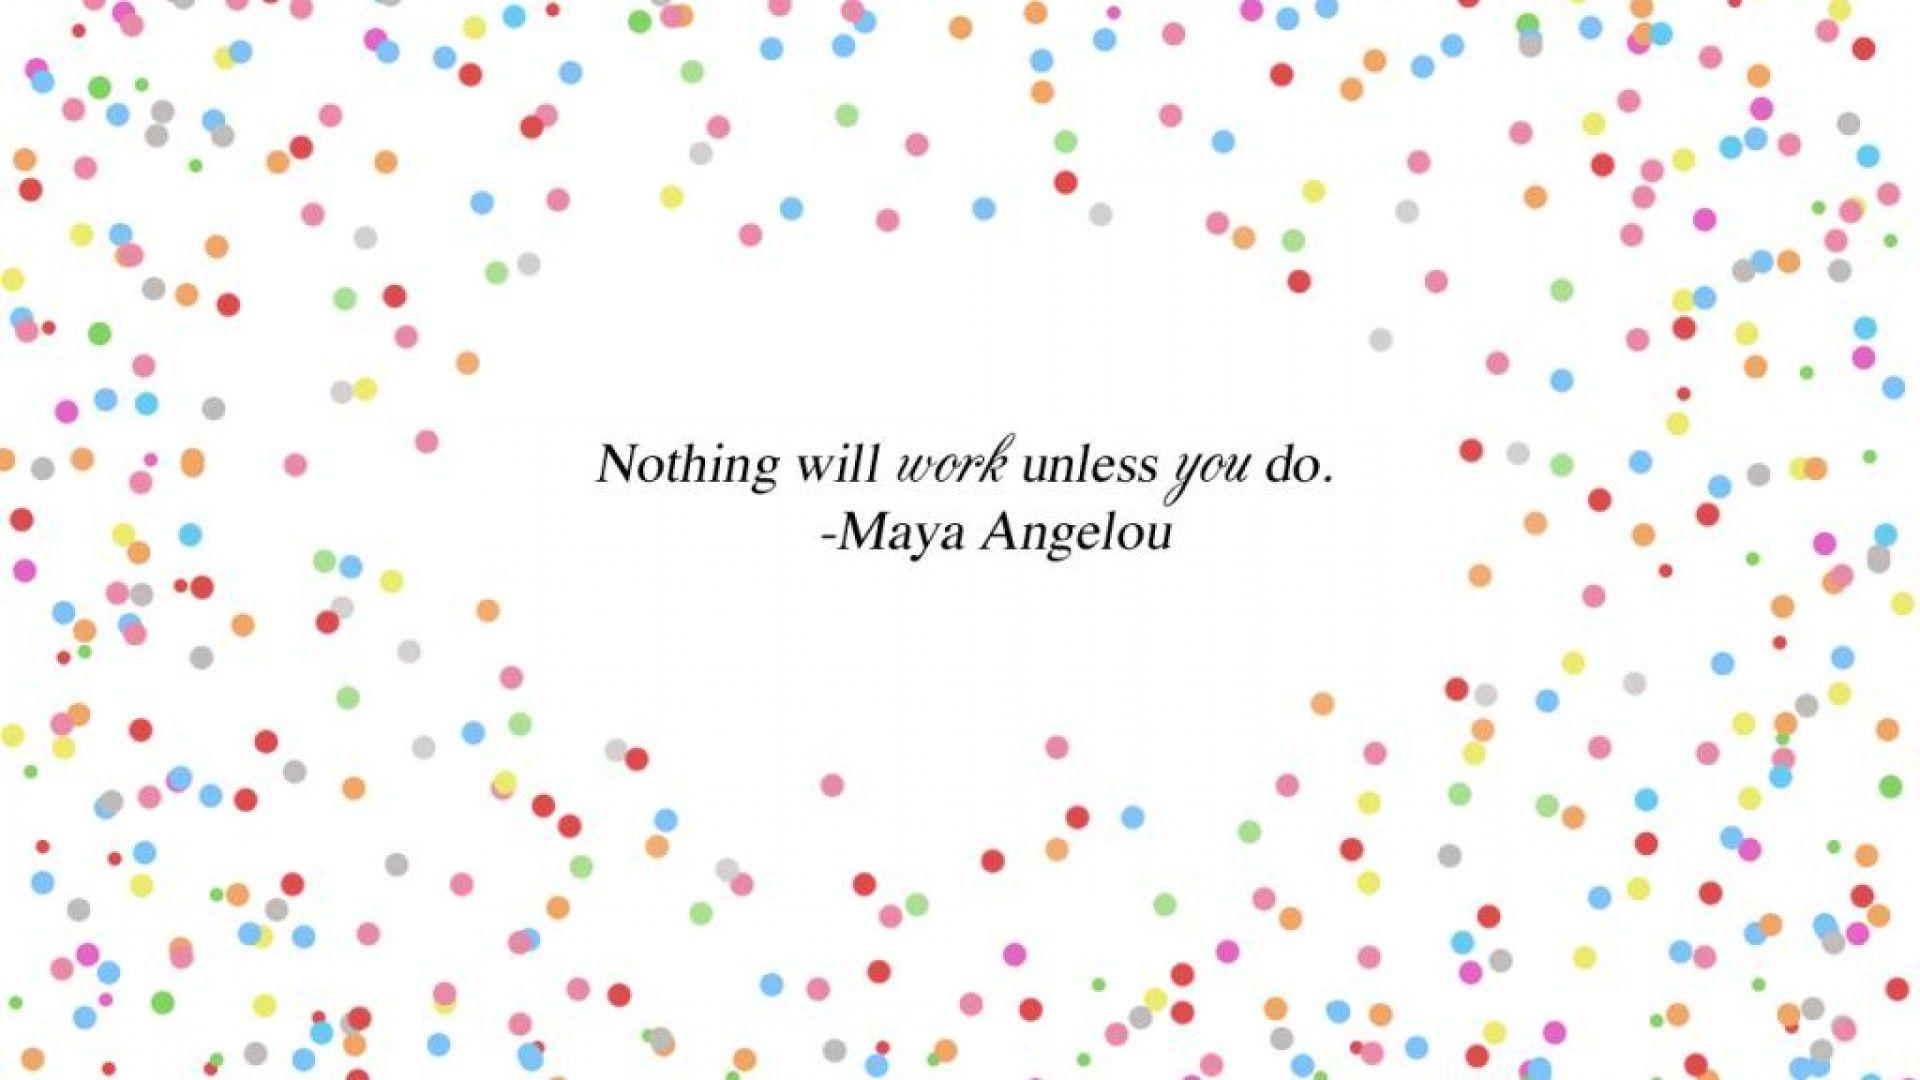 Fascinating Kate Spade Quotes Wallpaper Cardigans Desktop